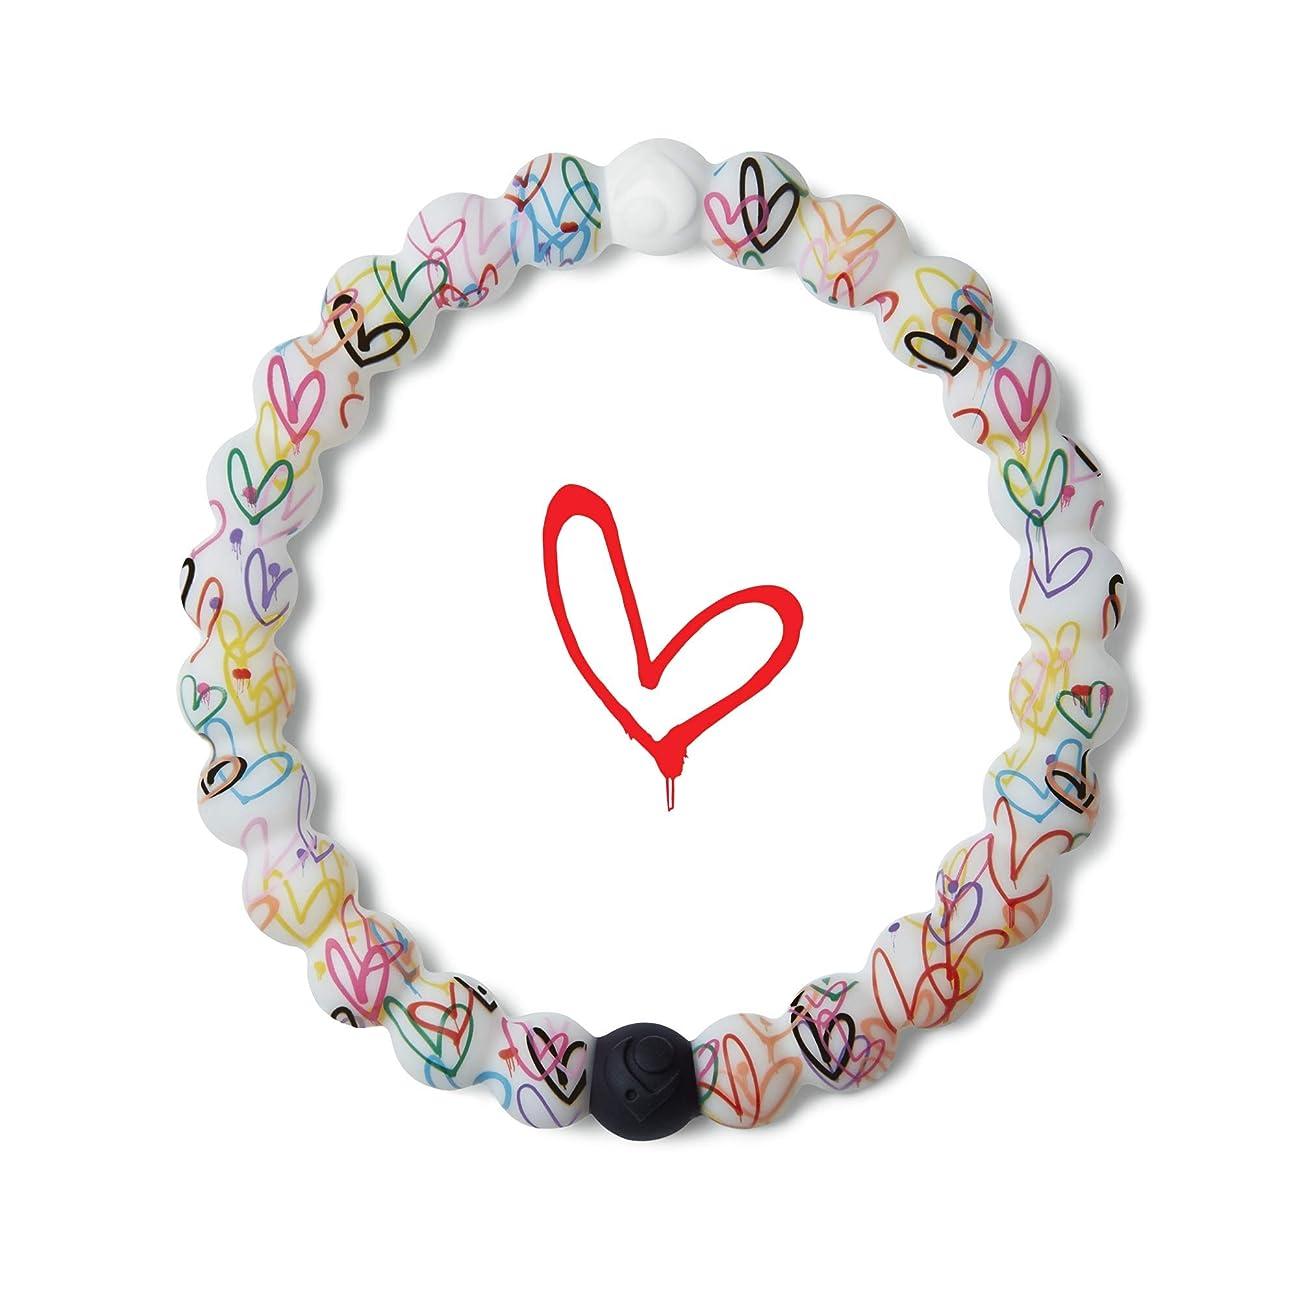 Lokai Hearts Cause Collection Bracelet